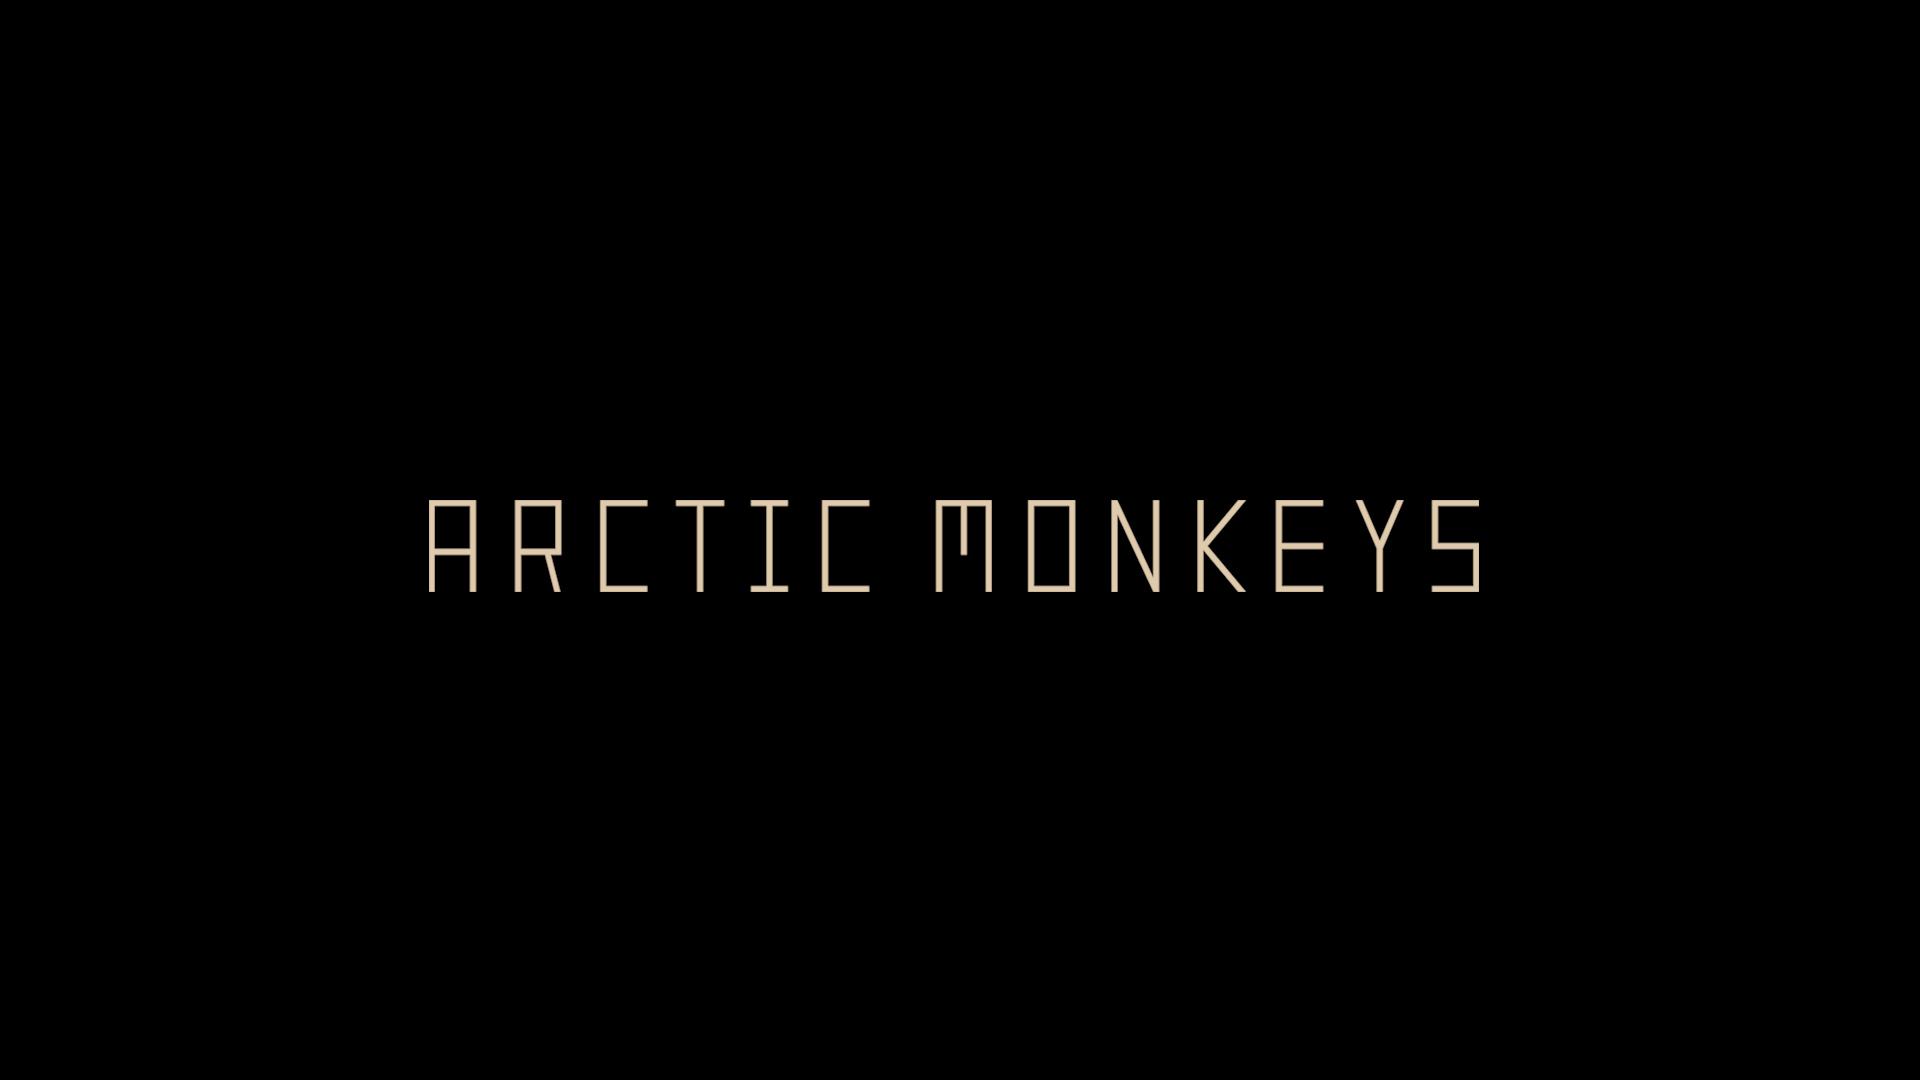 Arctic monkeys dating